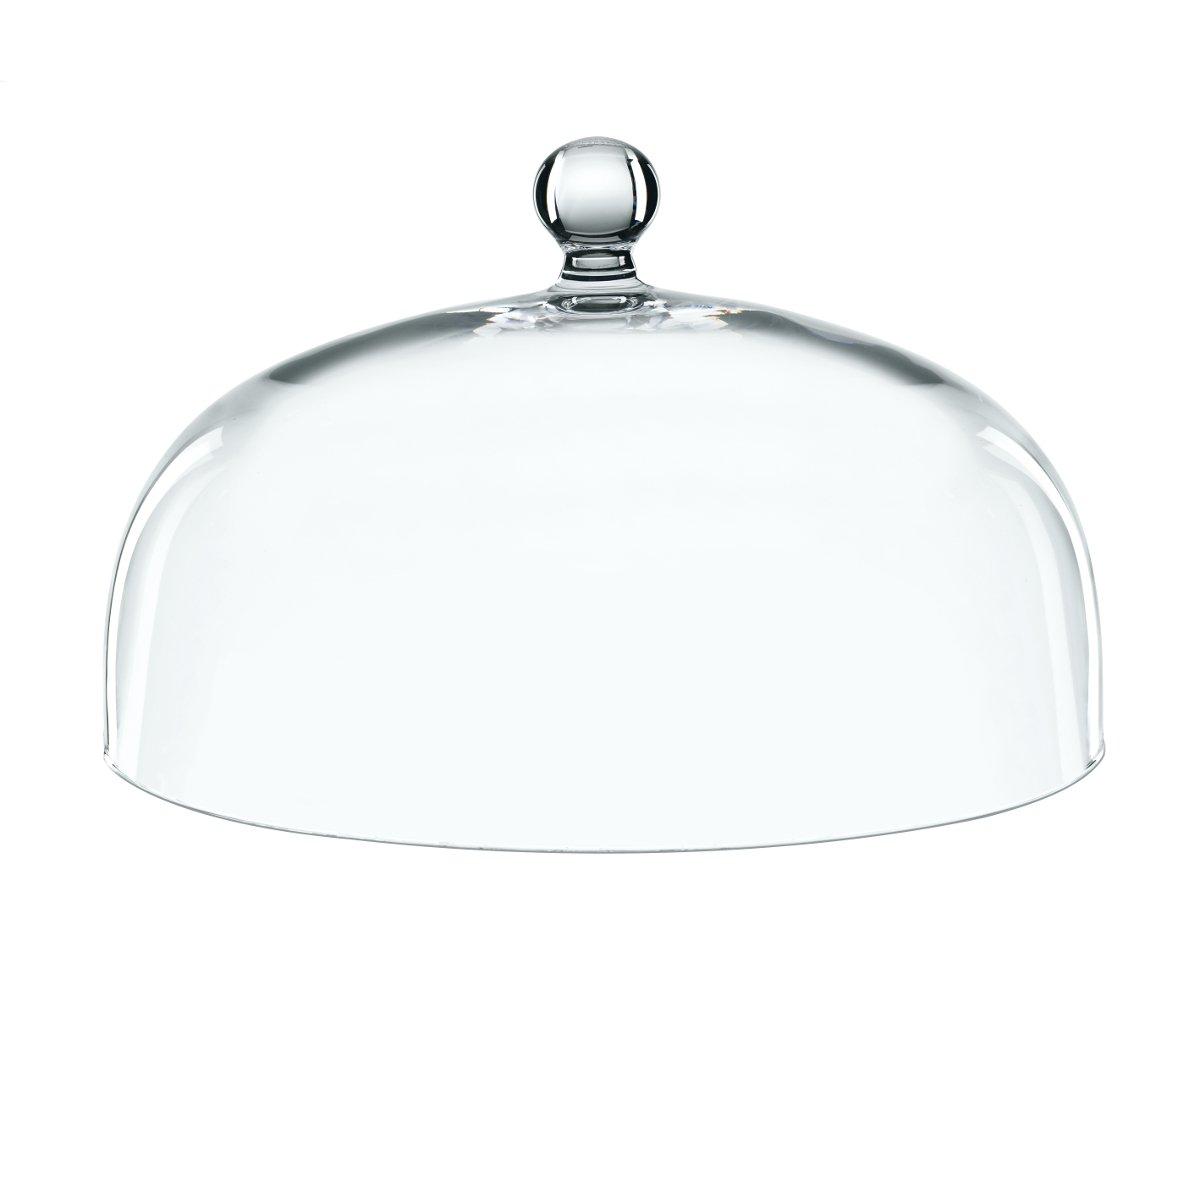 Nachtmann 99529 Tea Time Dome, One Size, Clear